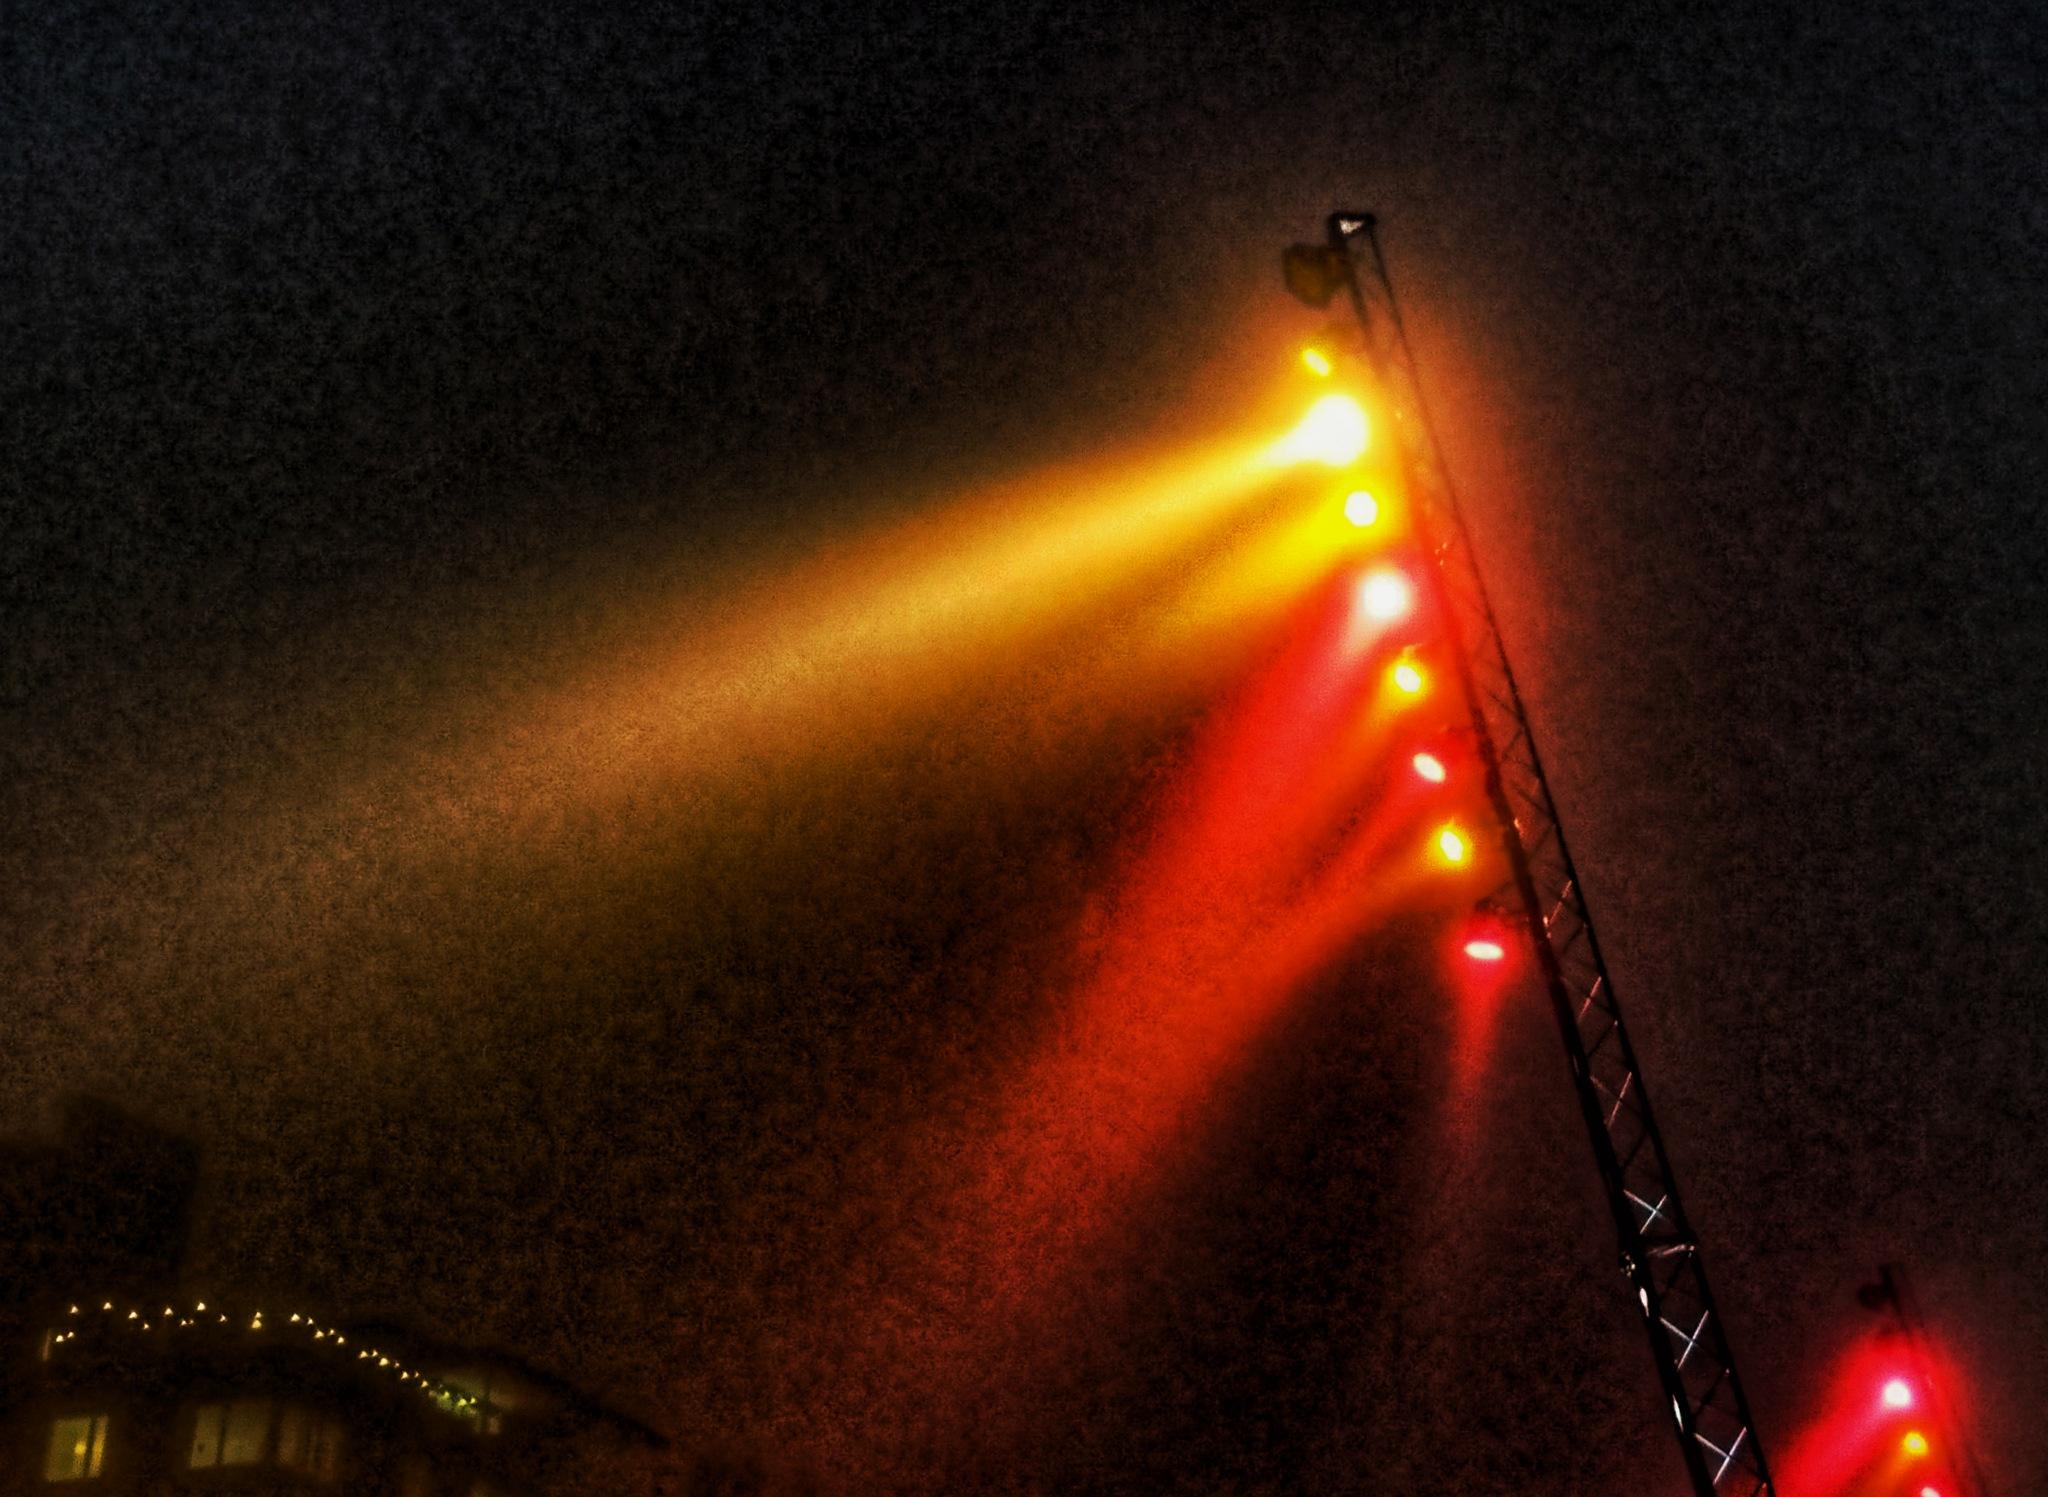 Lights by Krister Honkonen